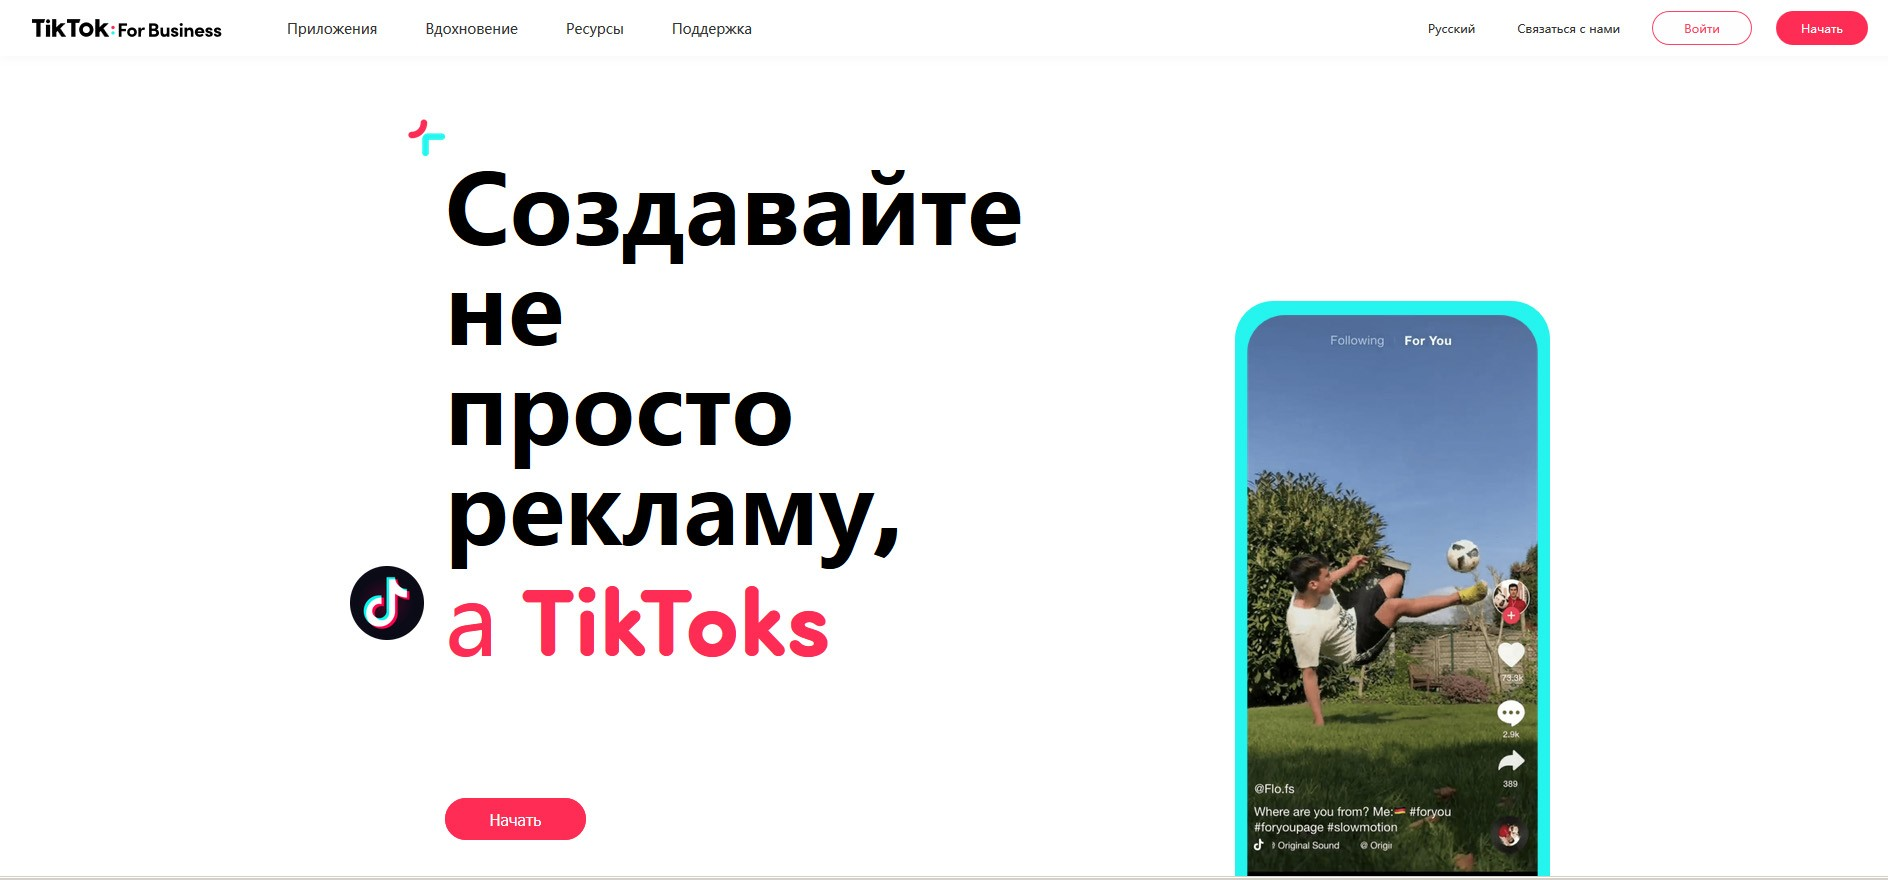 TikTok for Business: TikTok запустил платформу для бизнеса